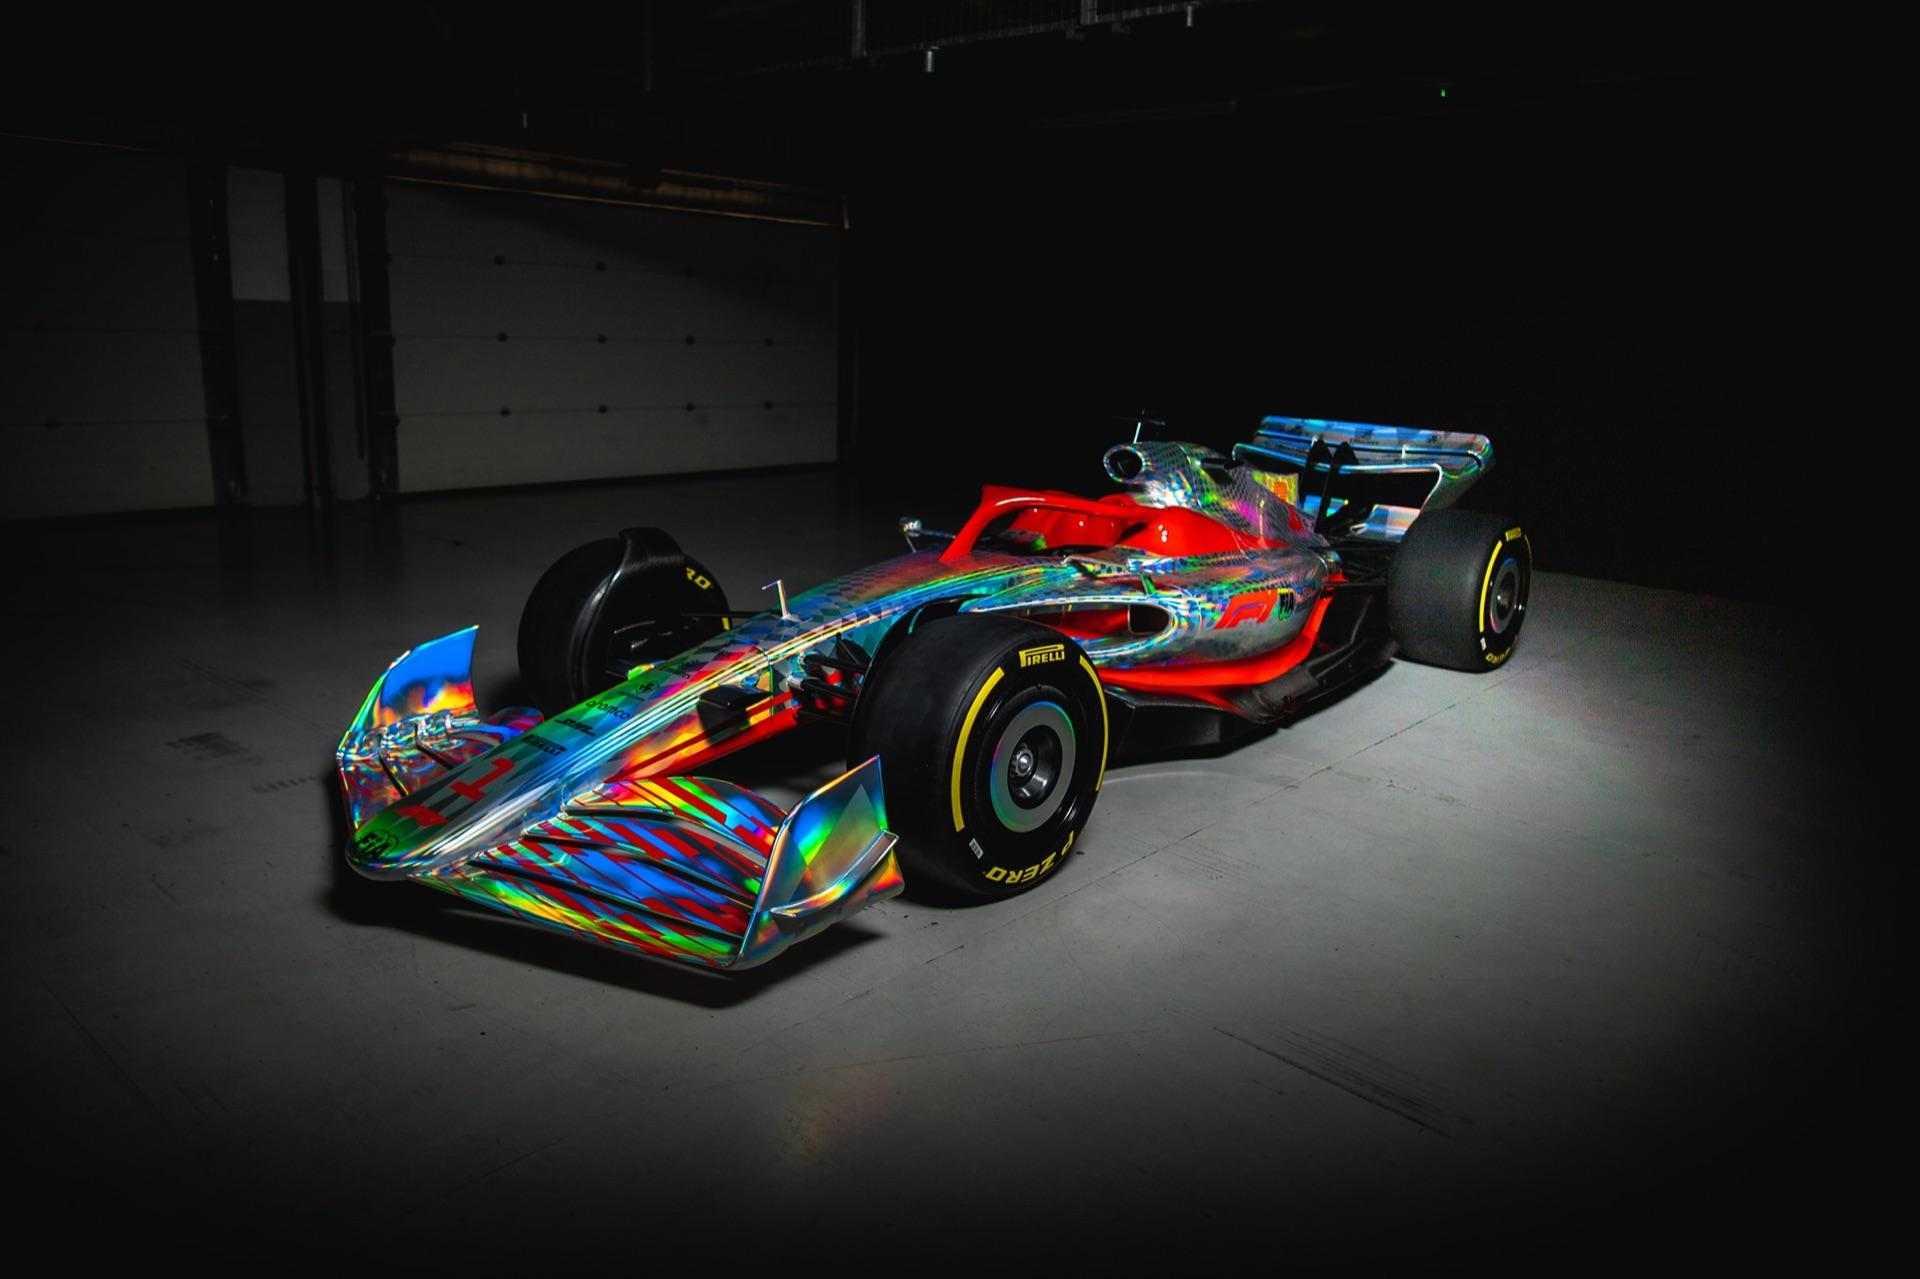 F1-Formula-1-car-2022-3_1920x1279